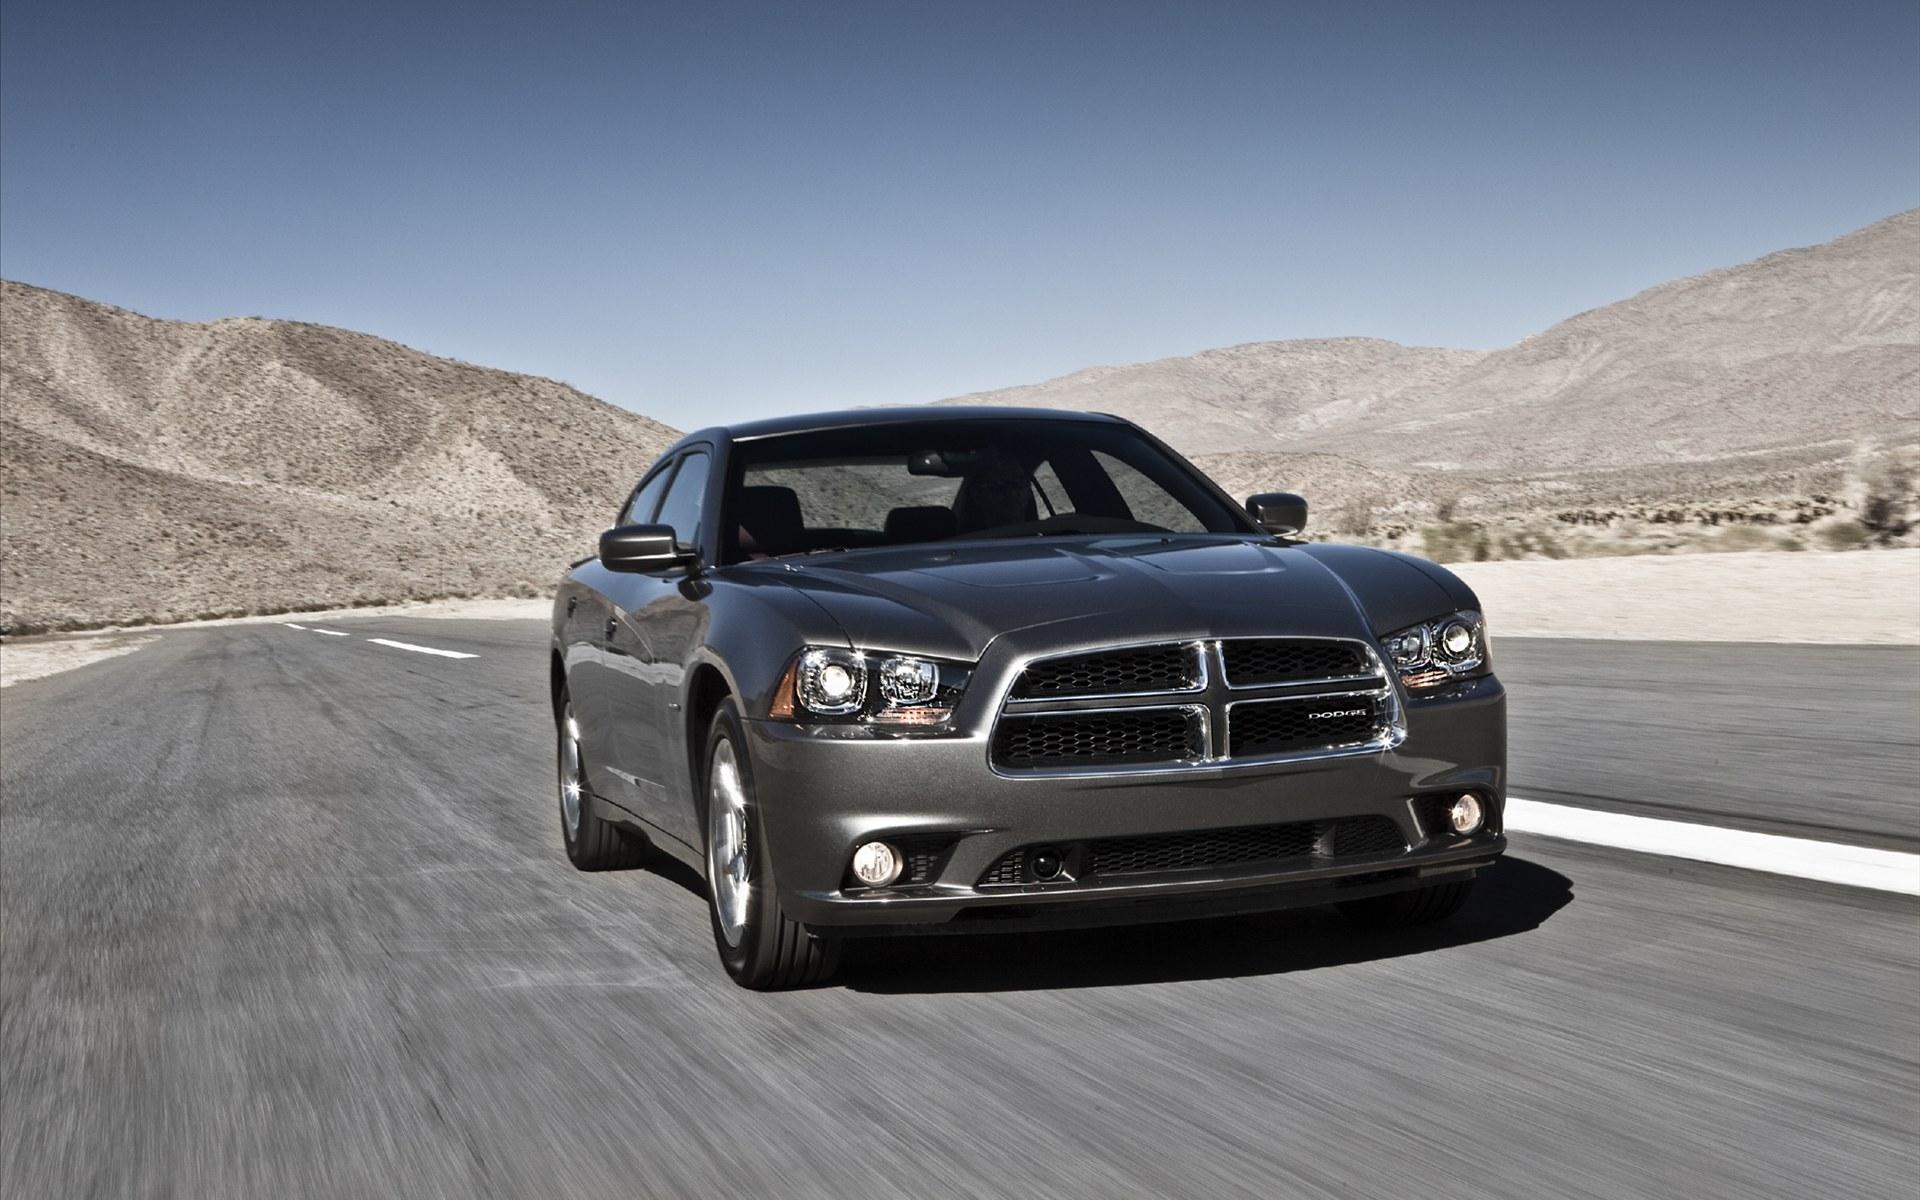 Dodge charger rt awd 2012 wallpaper 6 sense